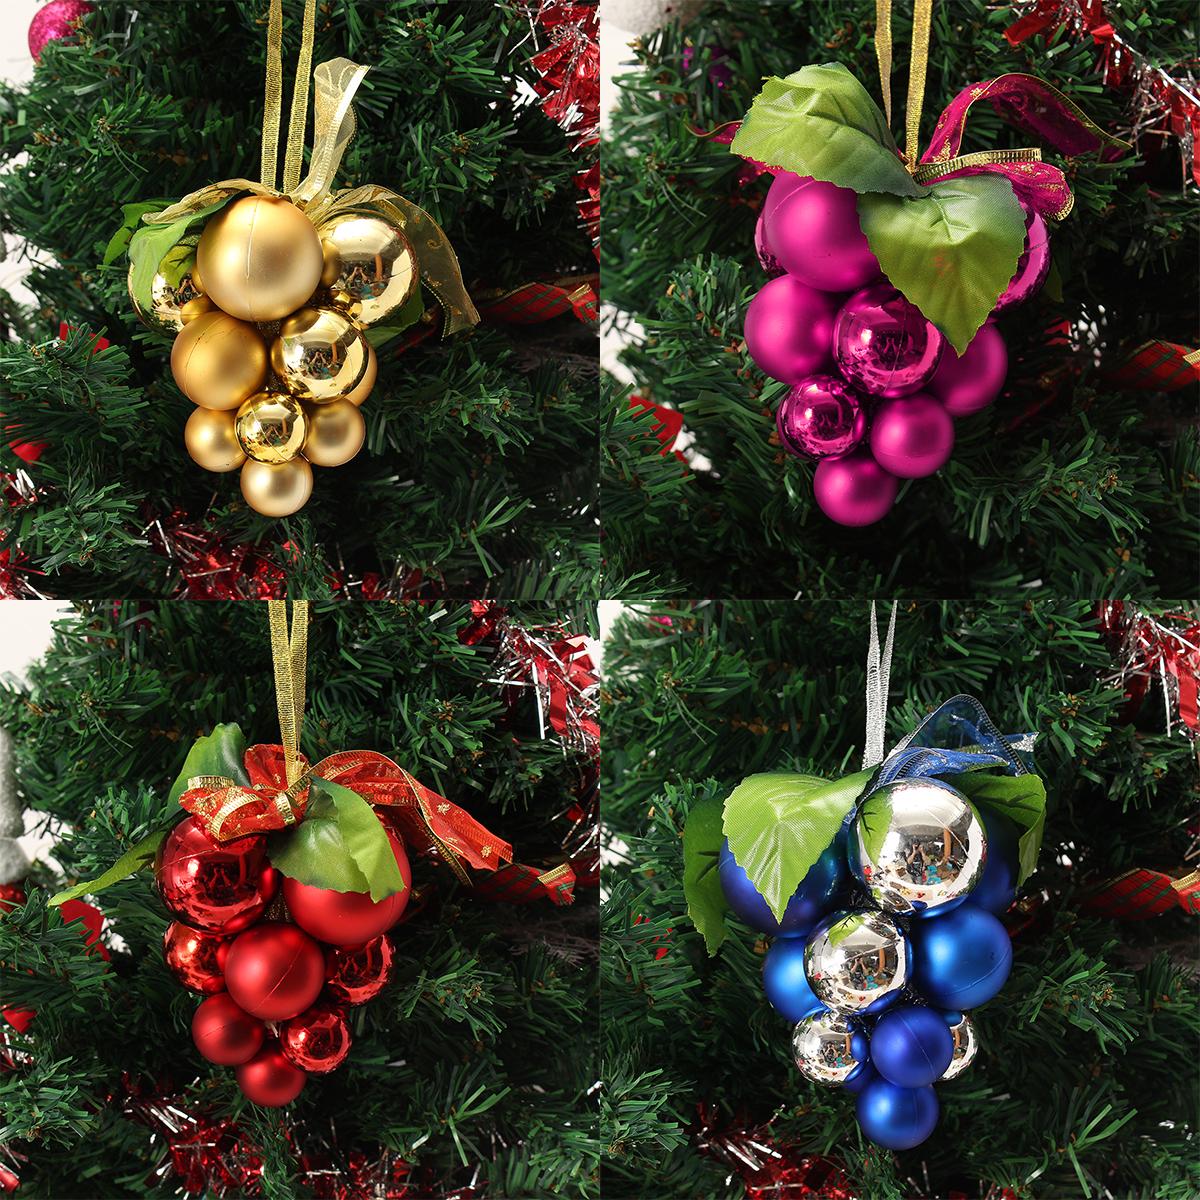 Christmas Ball Grape Strings Tree Decoration Ornaments Pendant Ball Hanging Adornments